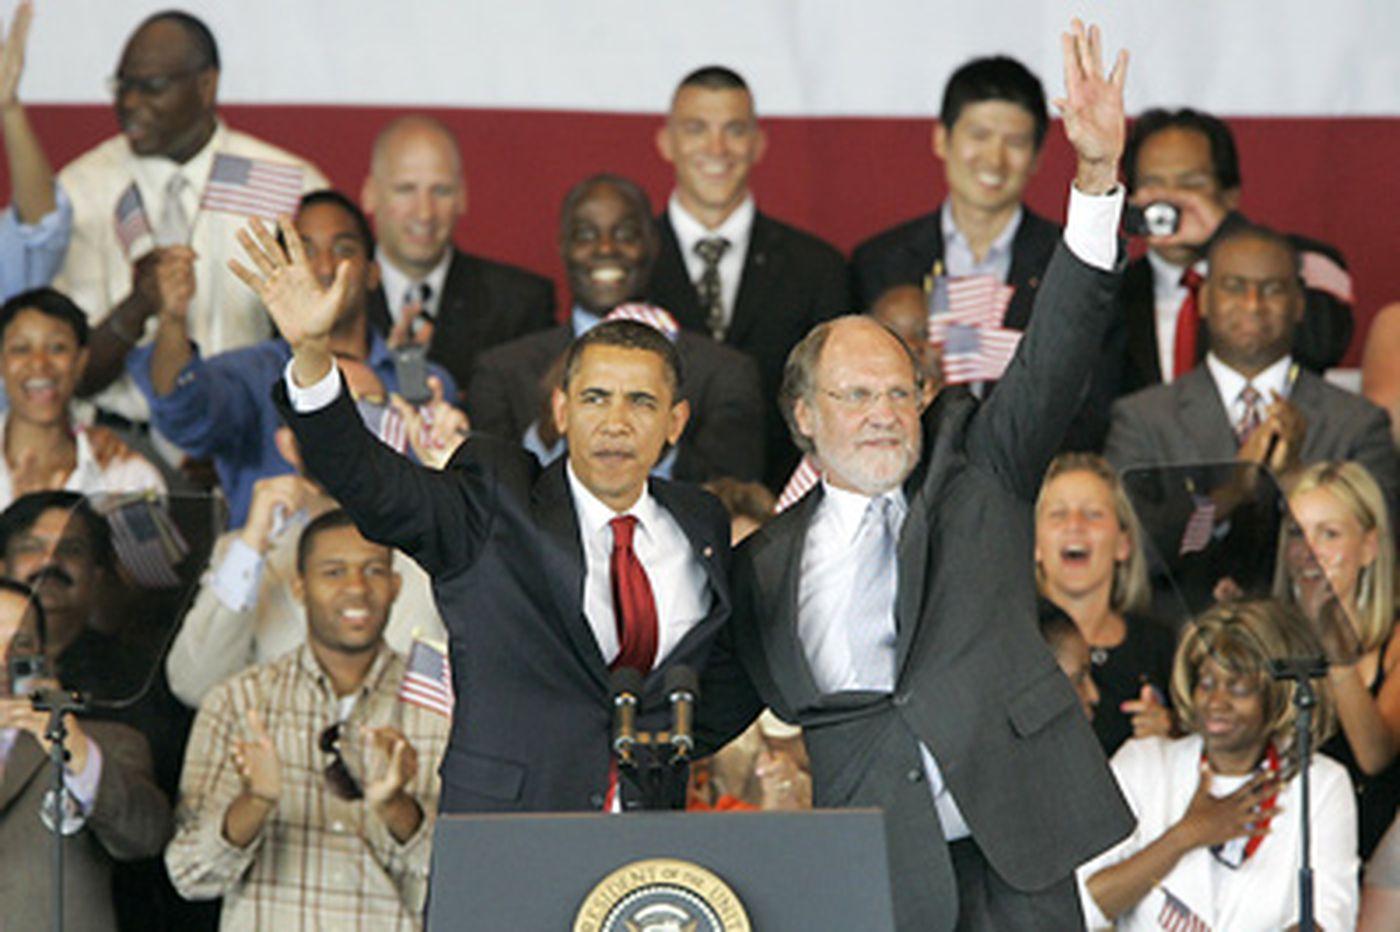 Obama praises Corzine at rally in N.J.